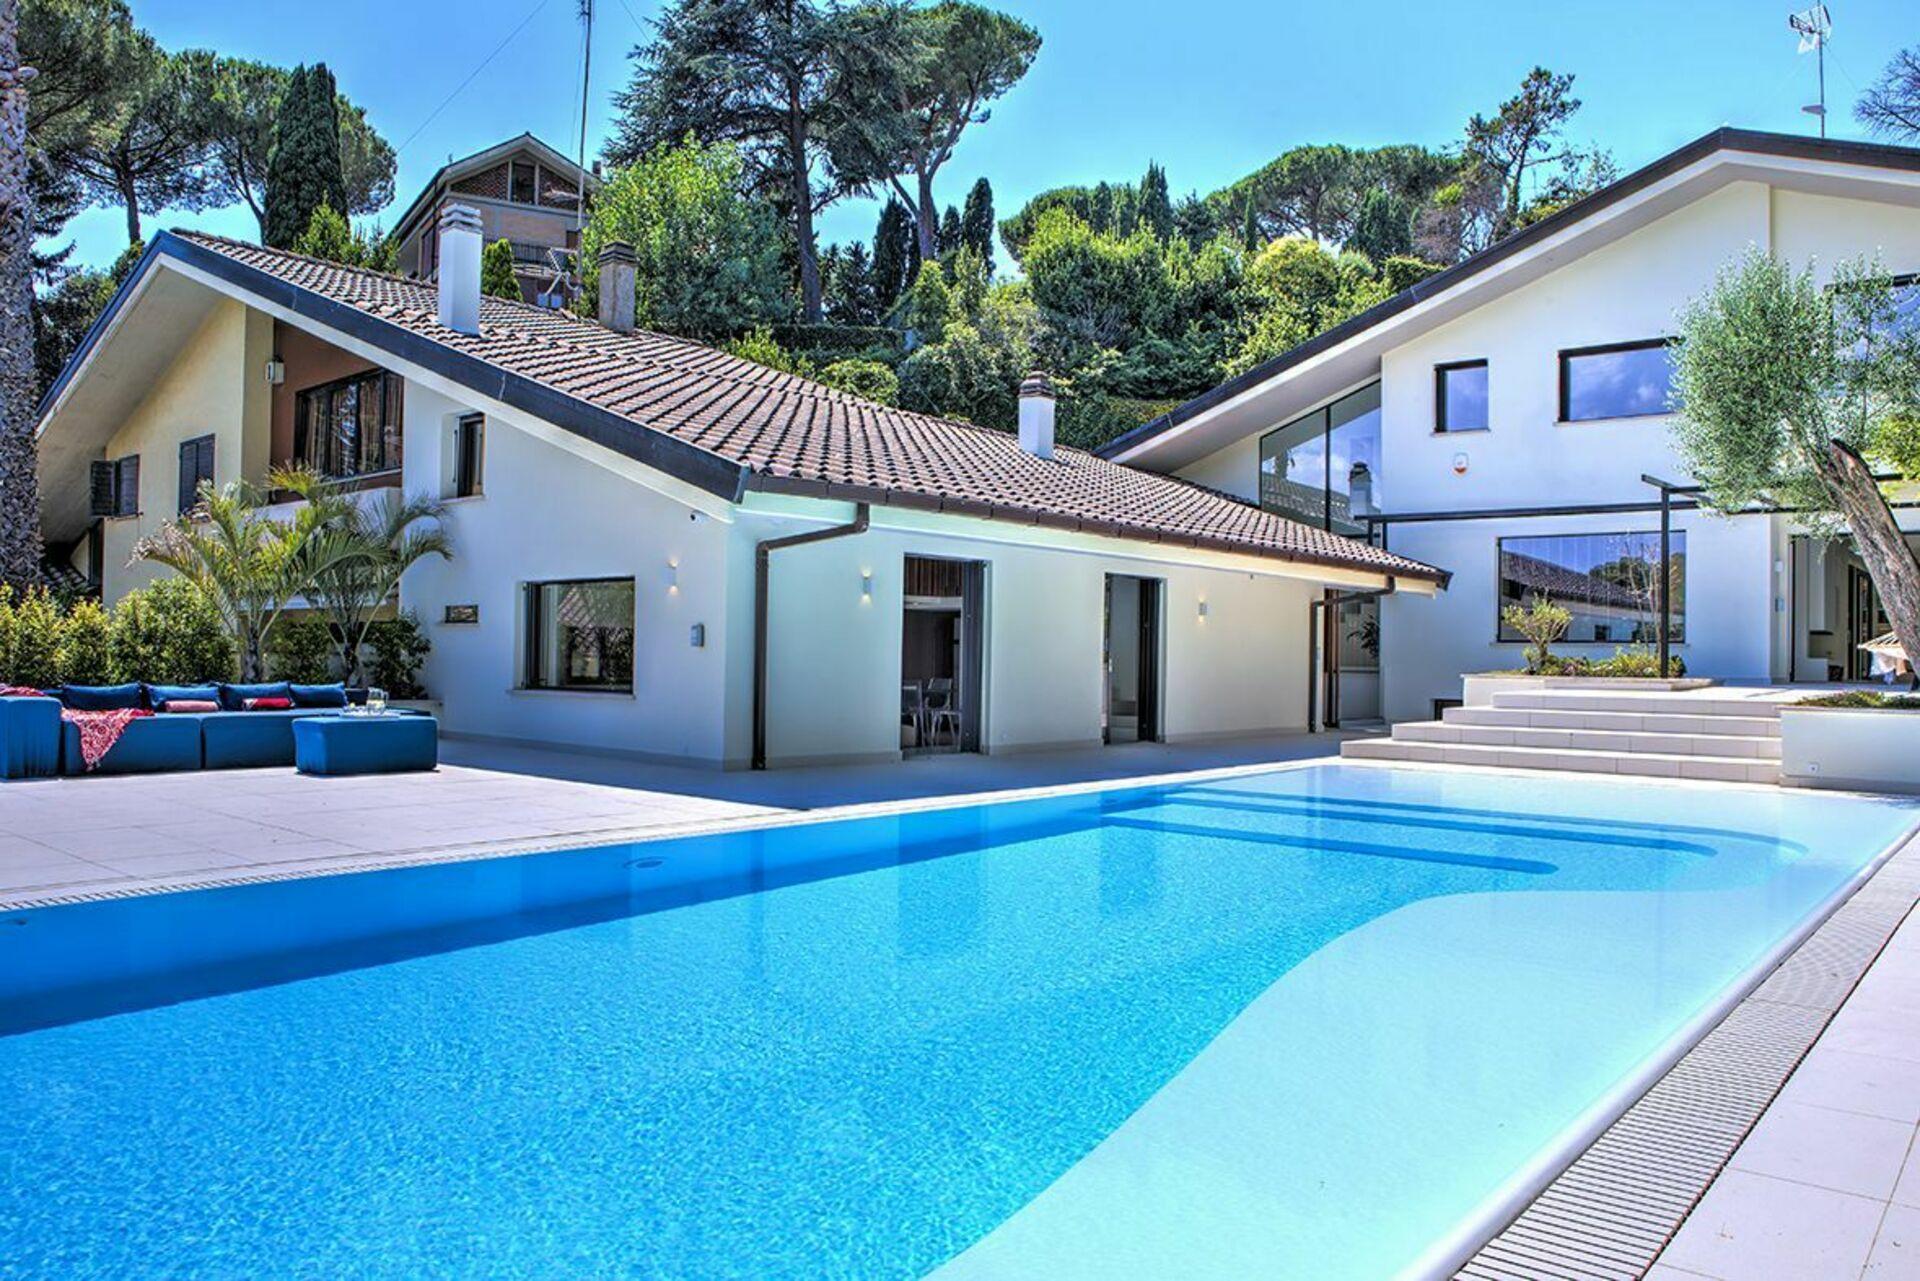 Villa Romana, Luxus Ferienhaus in Rom, Italien - 10 ...